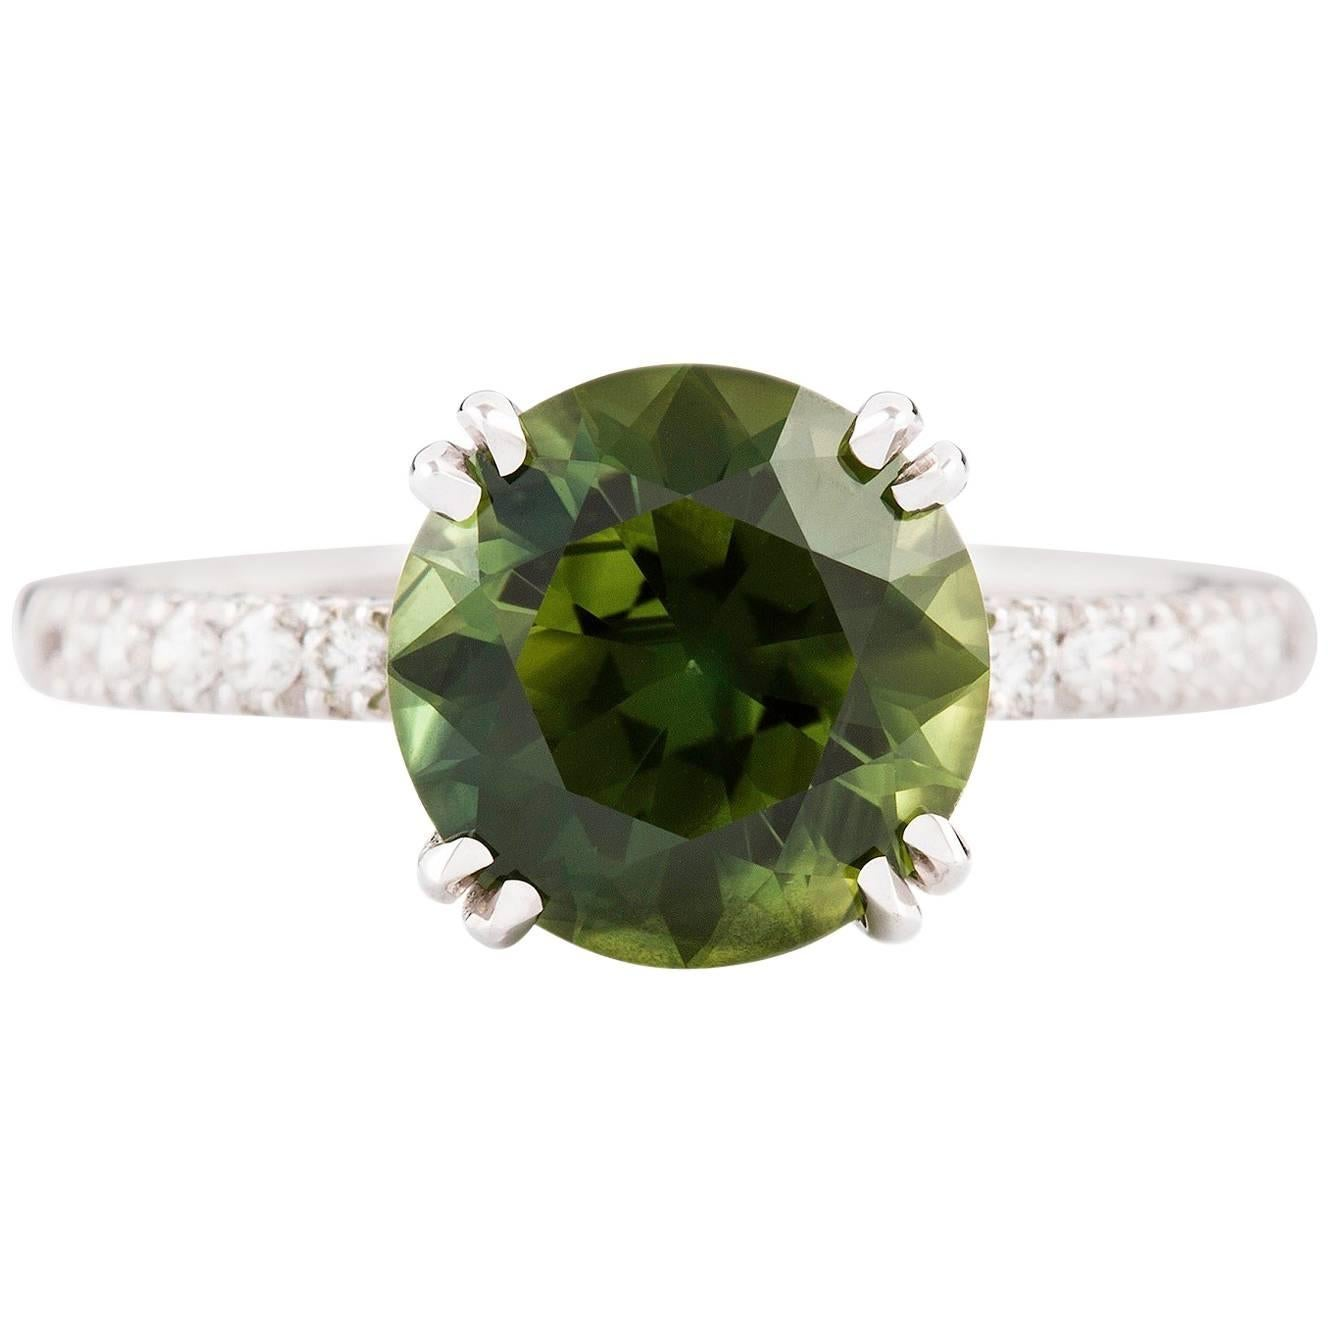 Kian Design White Gold 3.67 Carat Round Green Sapphire and Diamond  Ring